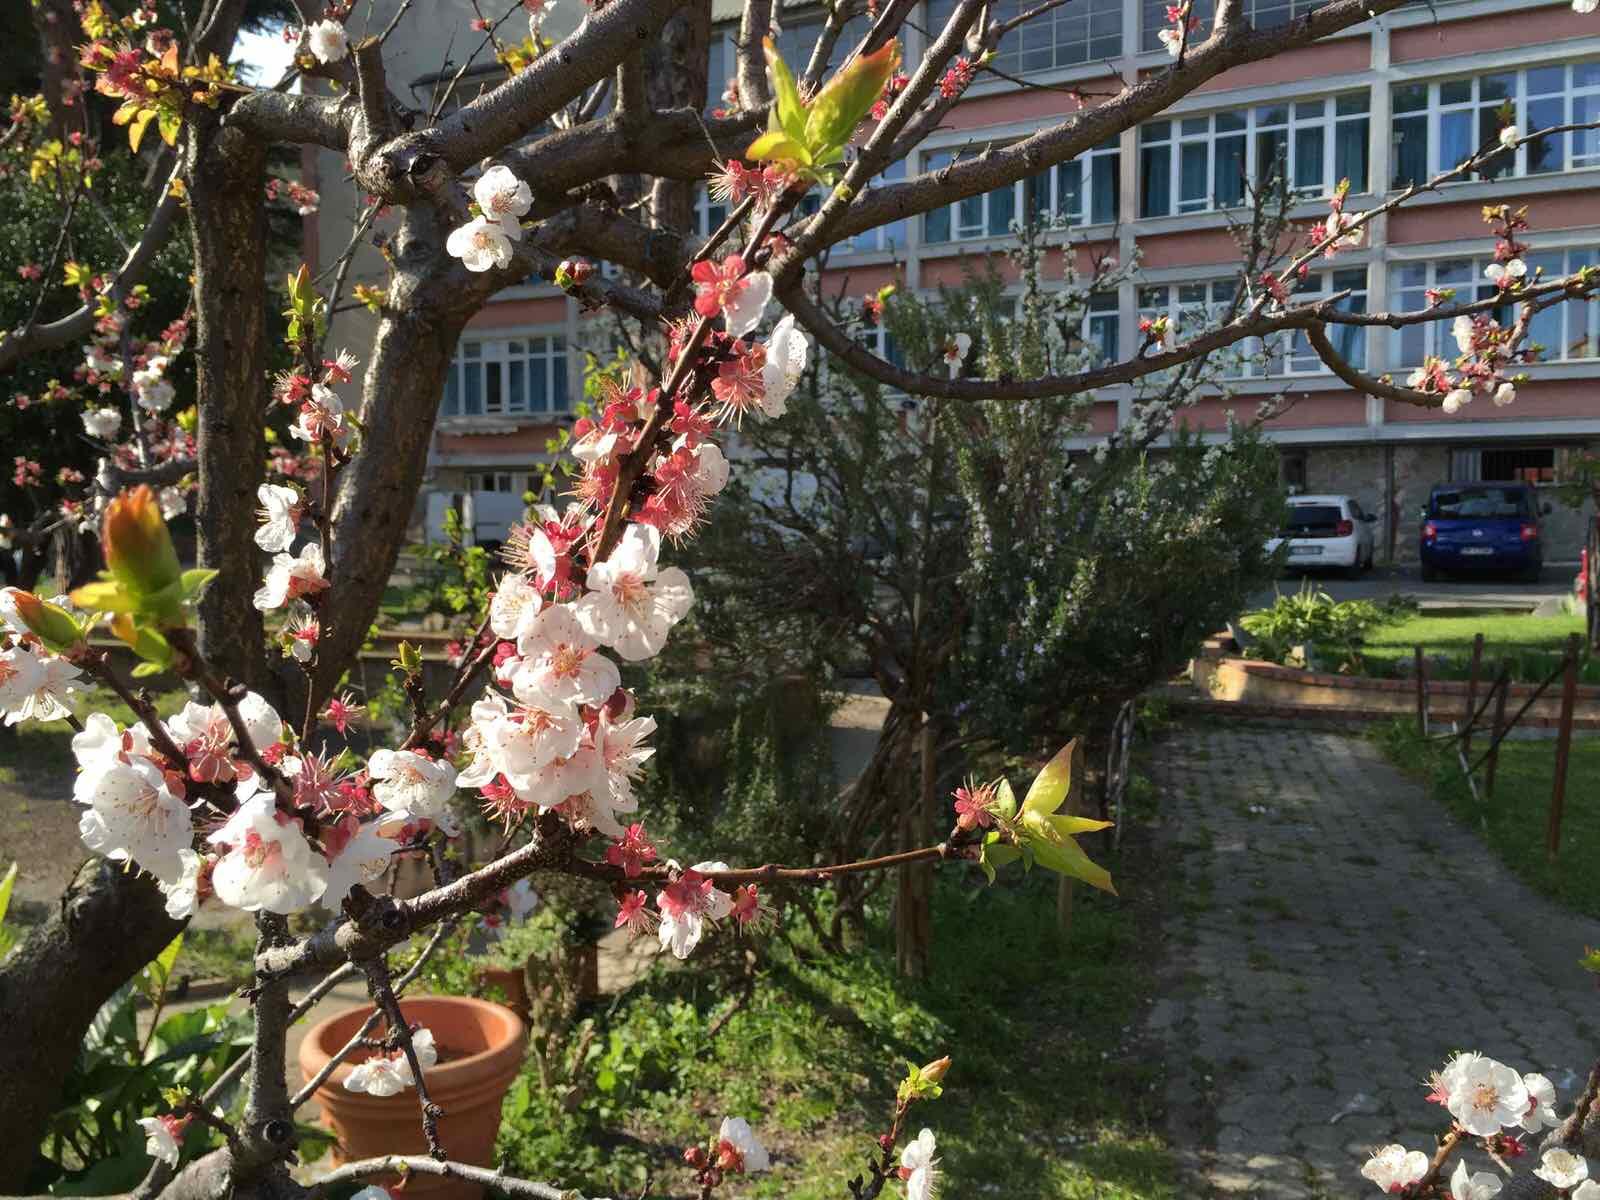 Centro Franco Chiarella - giardino 01